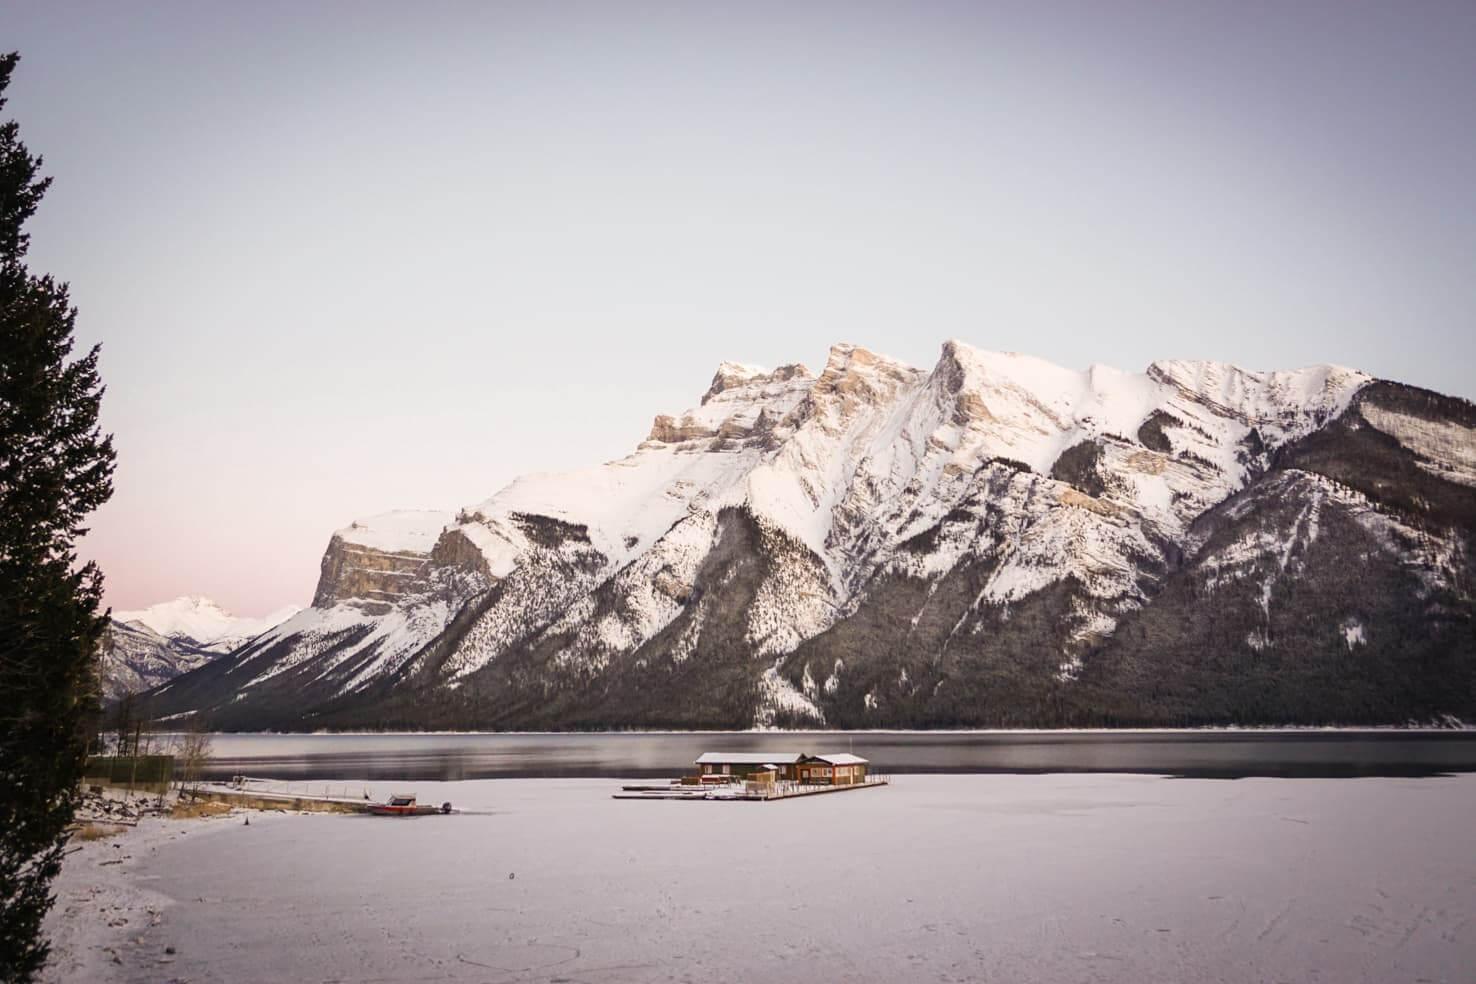 Ice skating in Banff National Park - Lake Minnewanka 2019